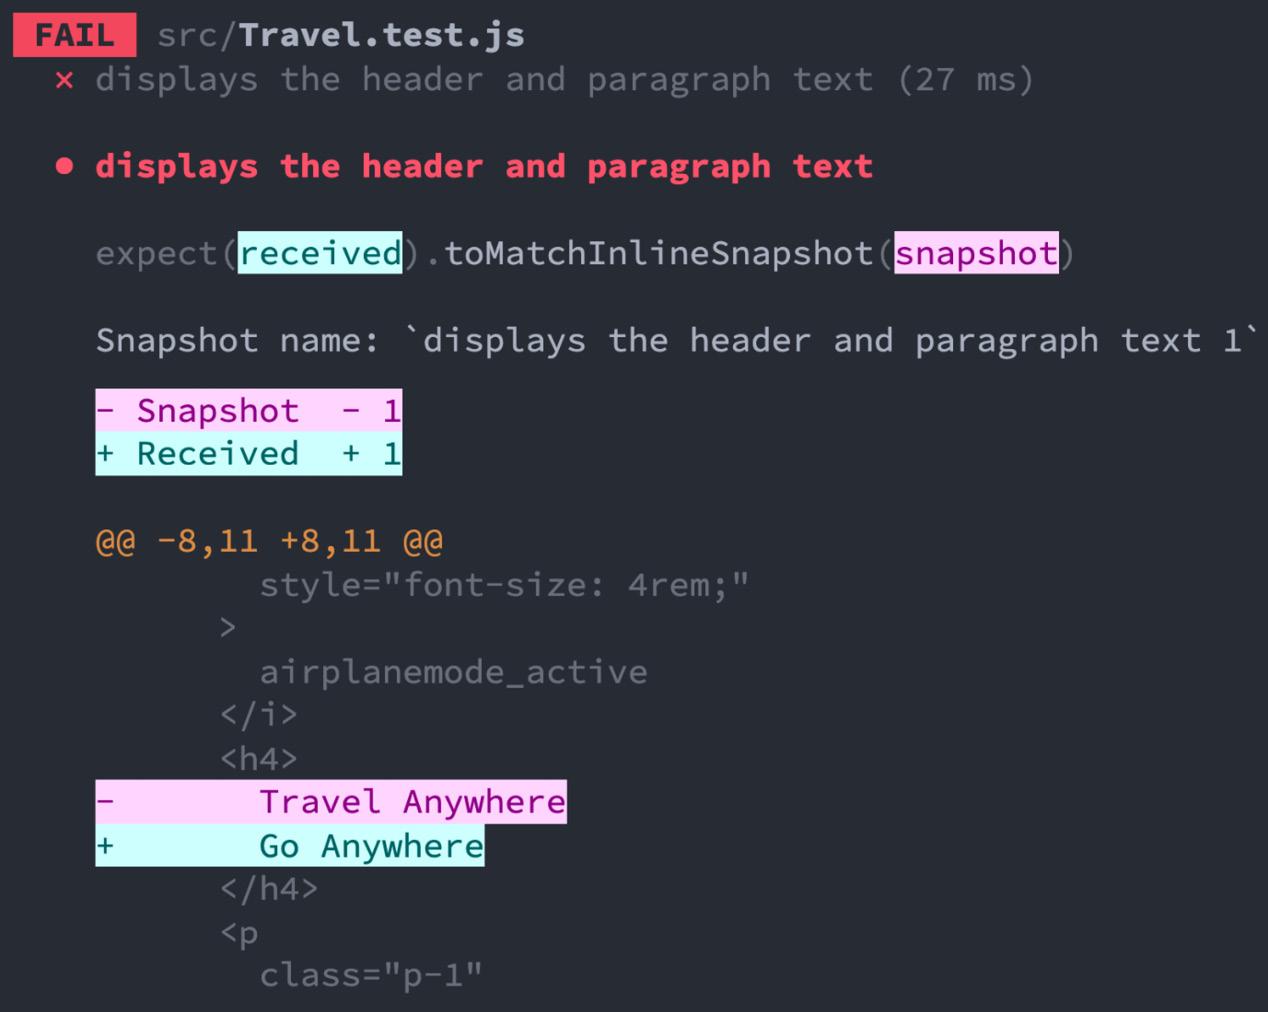 Figure 2.4 – Failed travel snapshot test